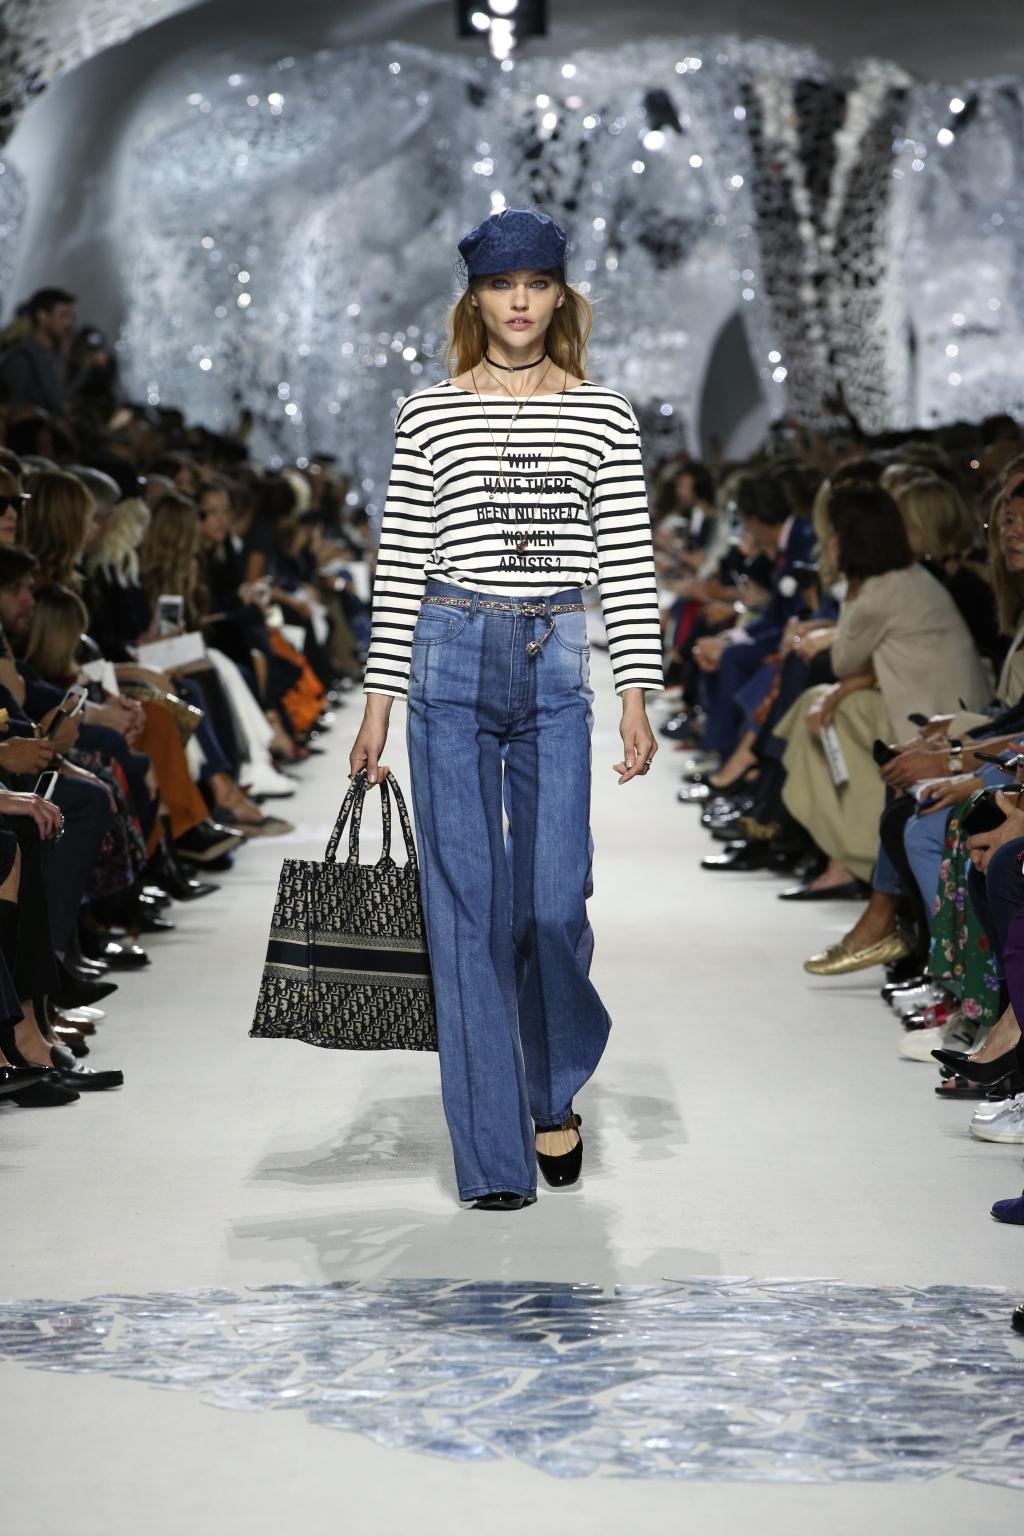 "Dior也湊湊熱鬧,創作總監Maria Grazia Chiuri在2018年春夏系列推出 ""Book Tote""袋款,繡滿品牌名字帆布袋;John Galliano時期的Saddle Bag更在2018年秋冬系列回歸,叫人期待。"